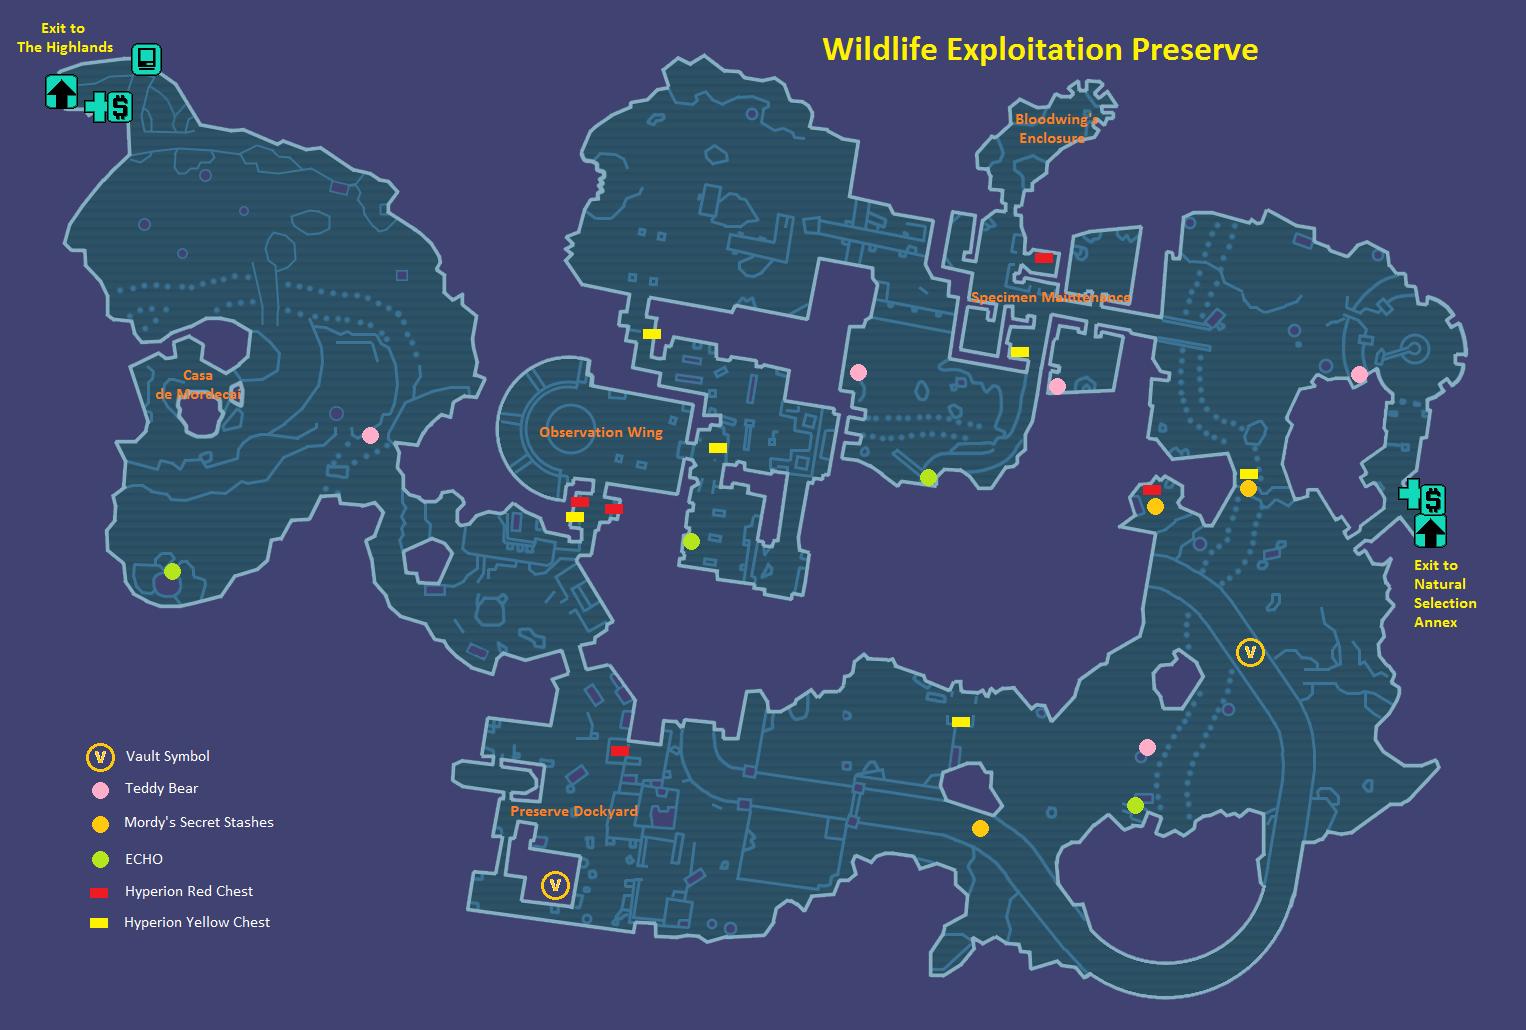 File:Wildlife Exploitation Preserve Map.png